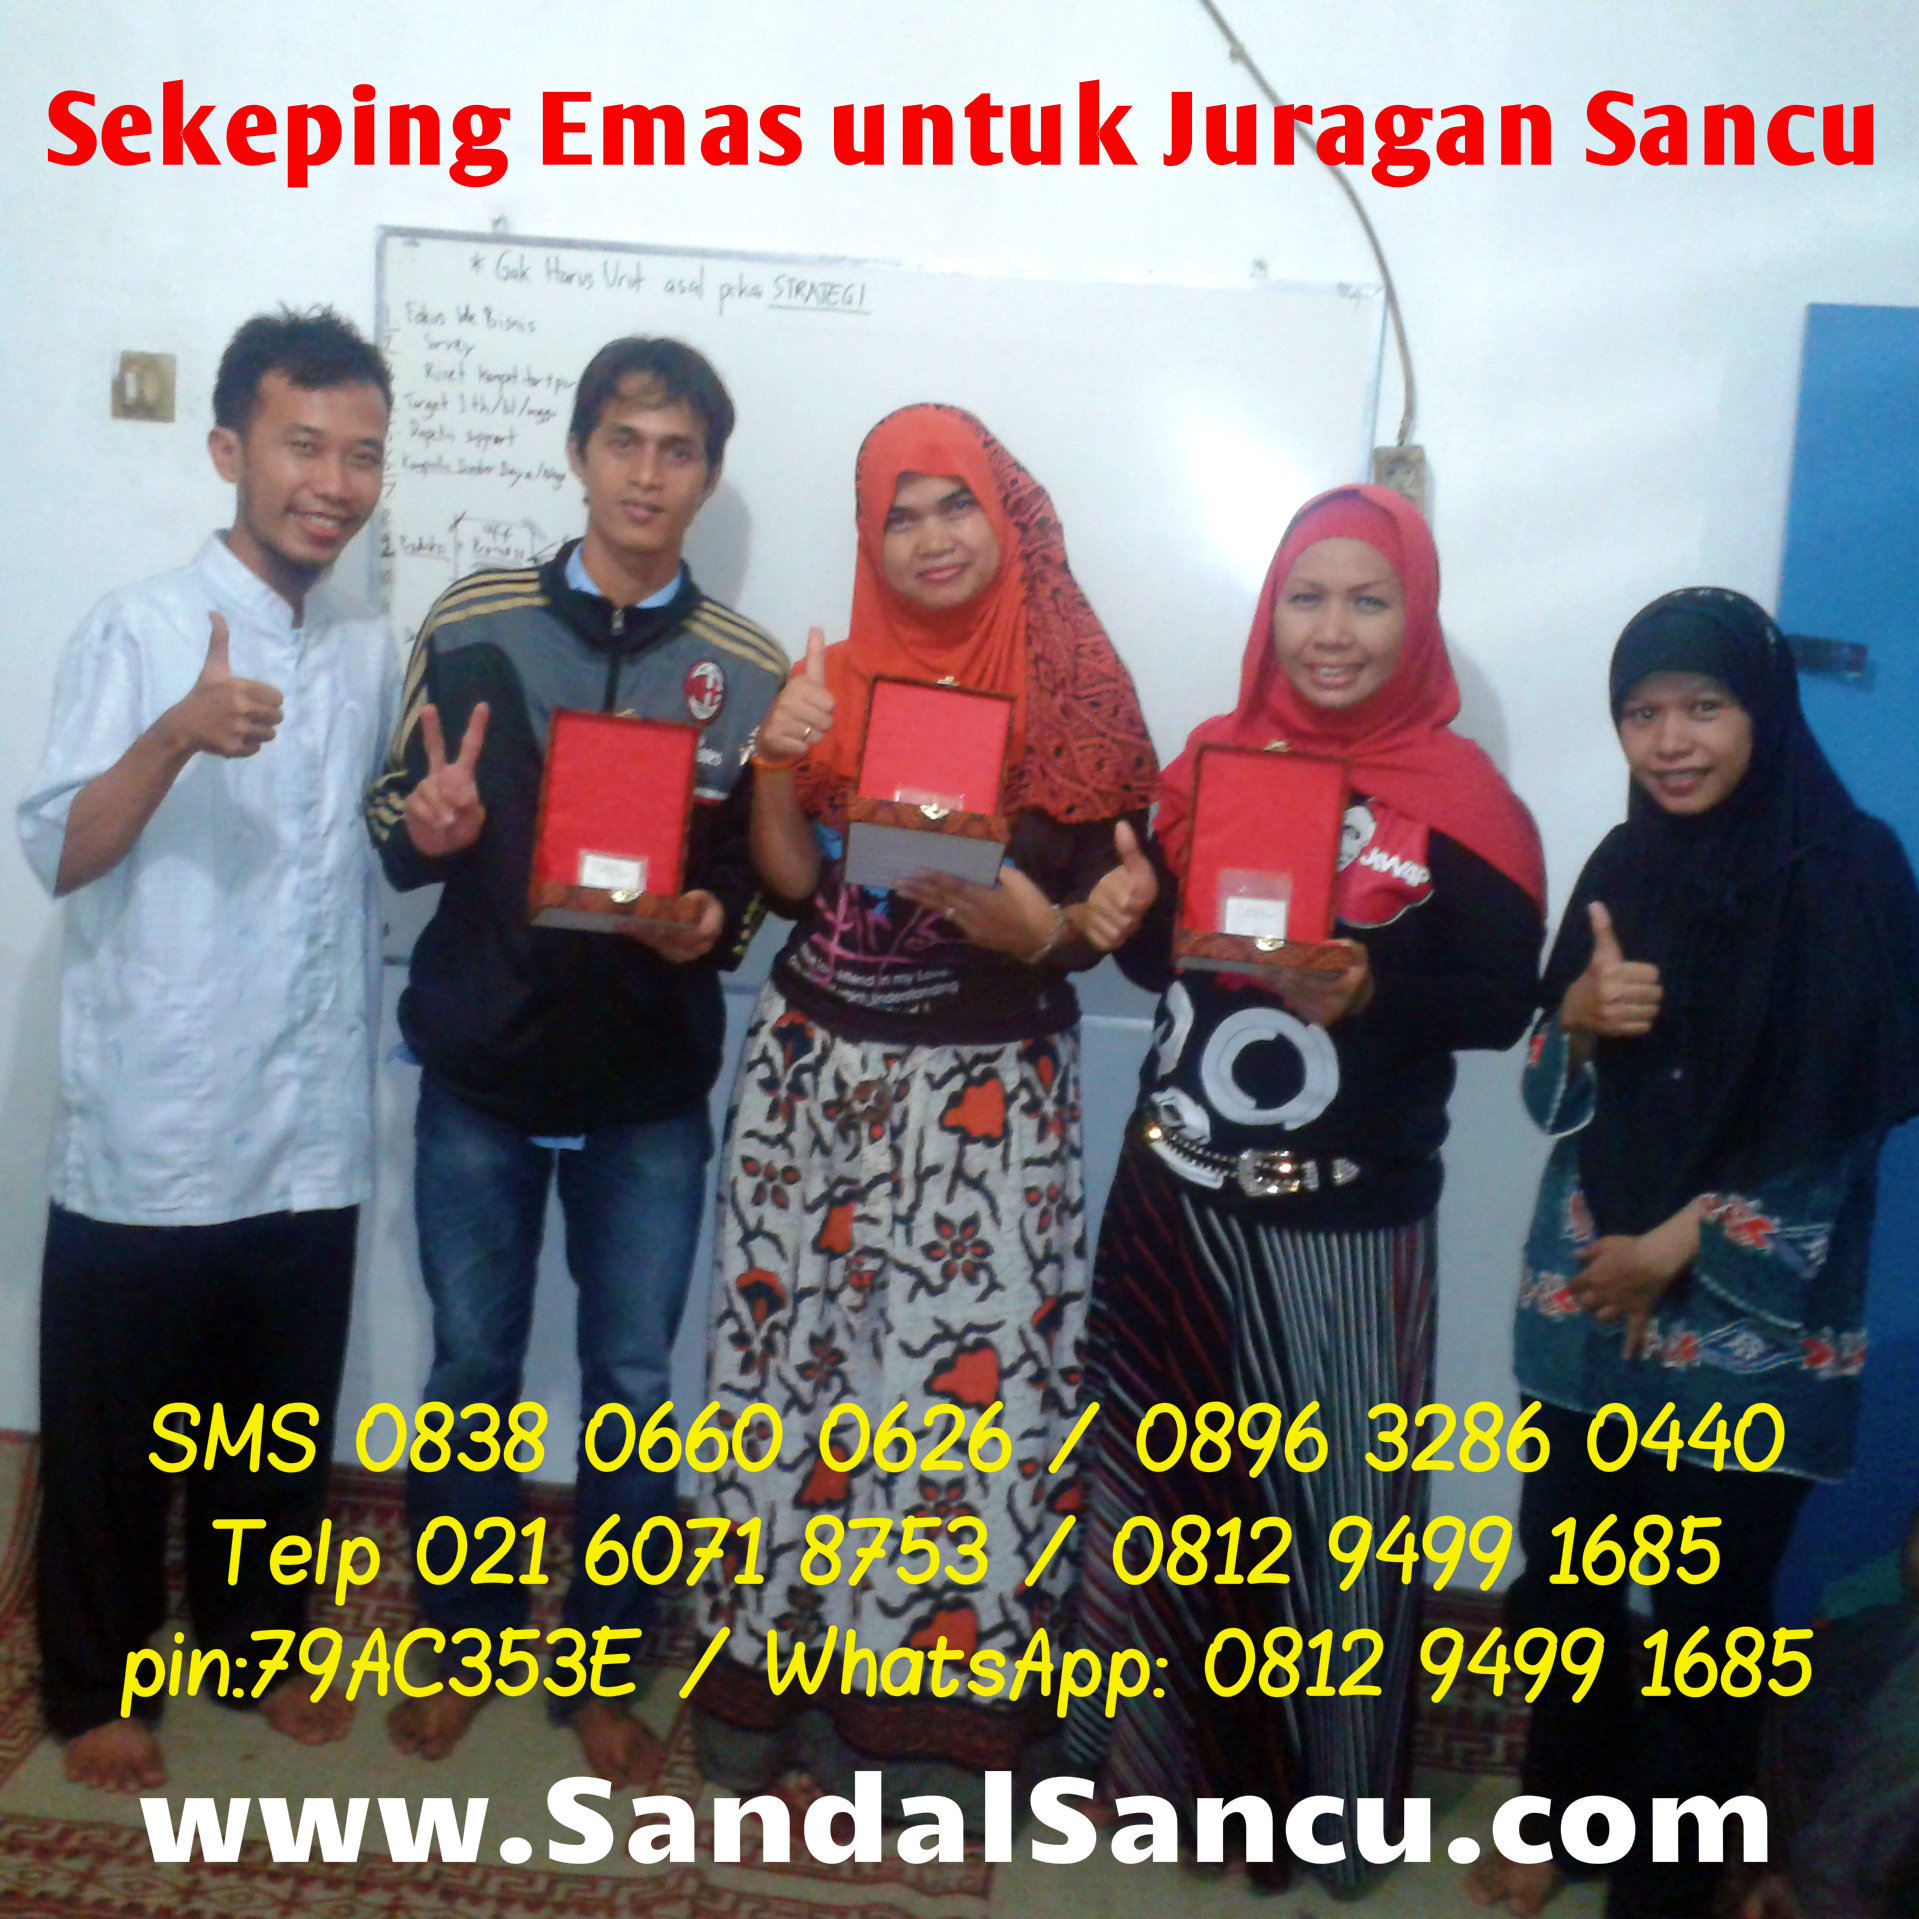 Marketing Sandal Lucu Sancu Jual Sandal SANCU Murah WA 0812